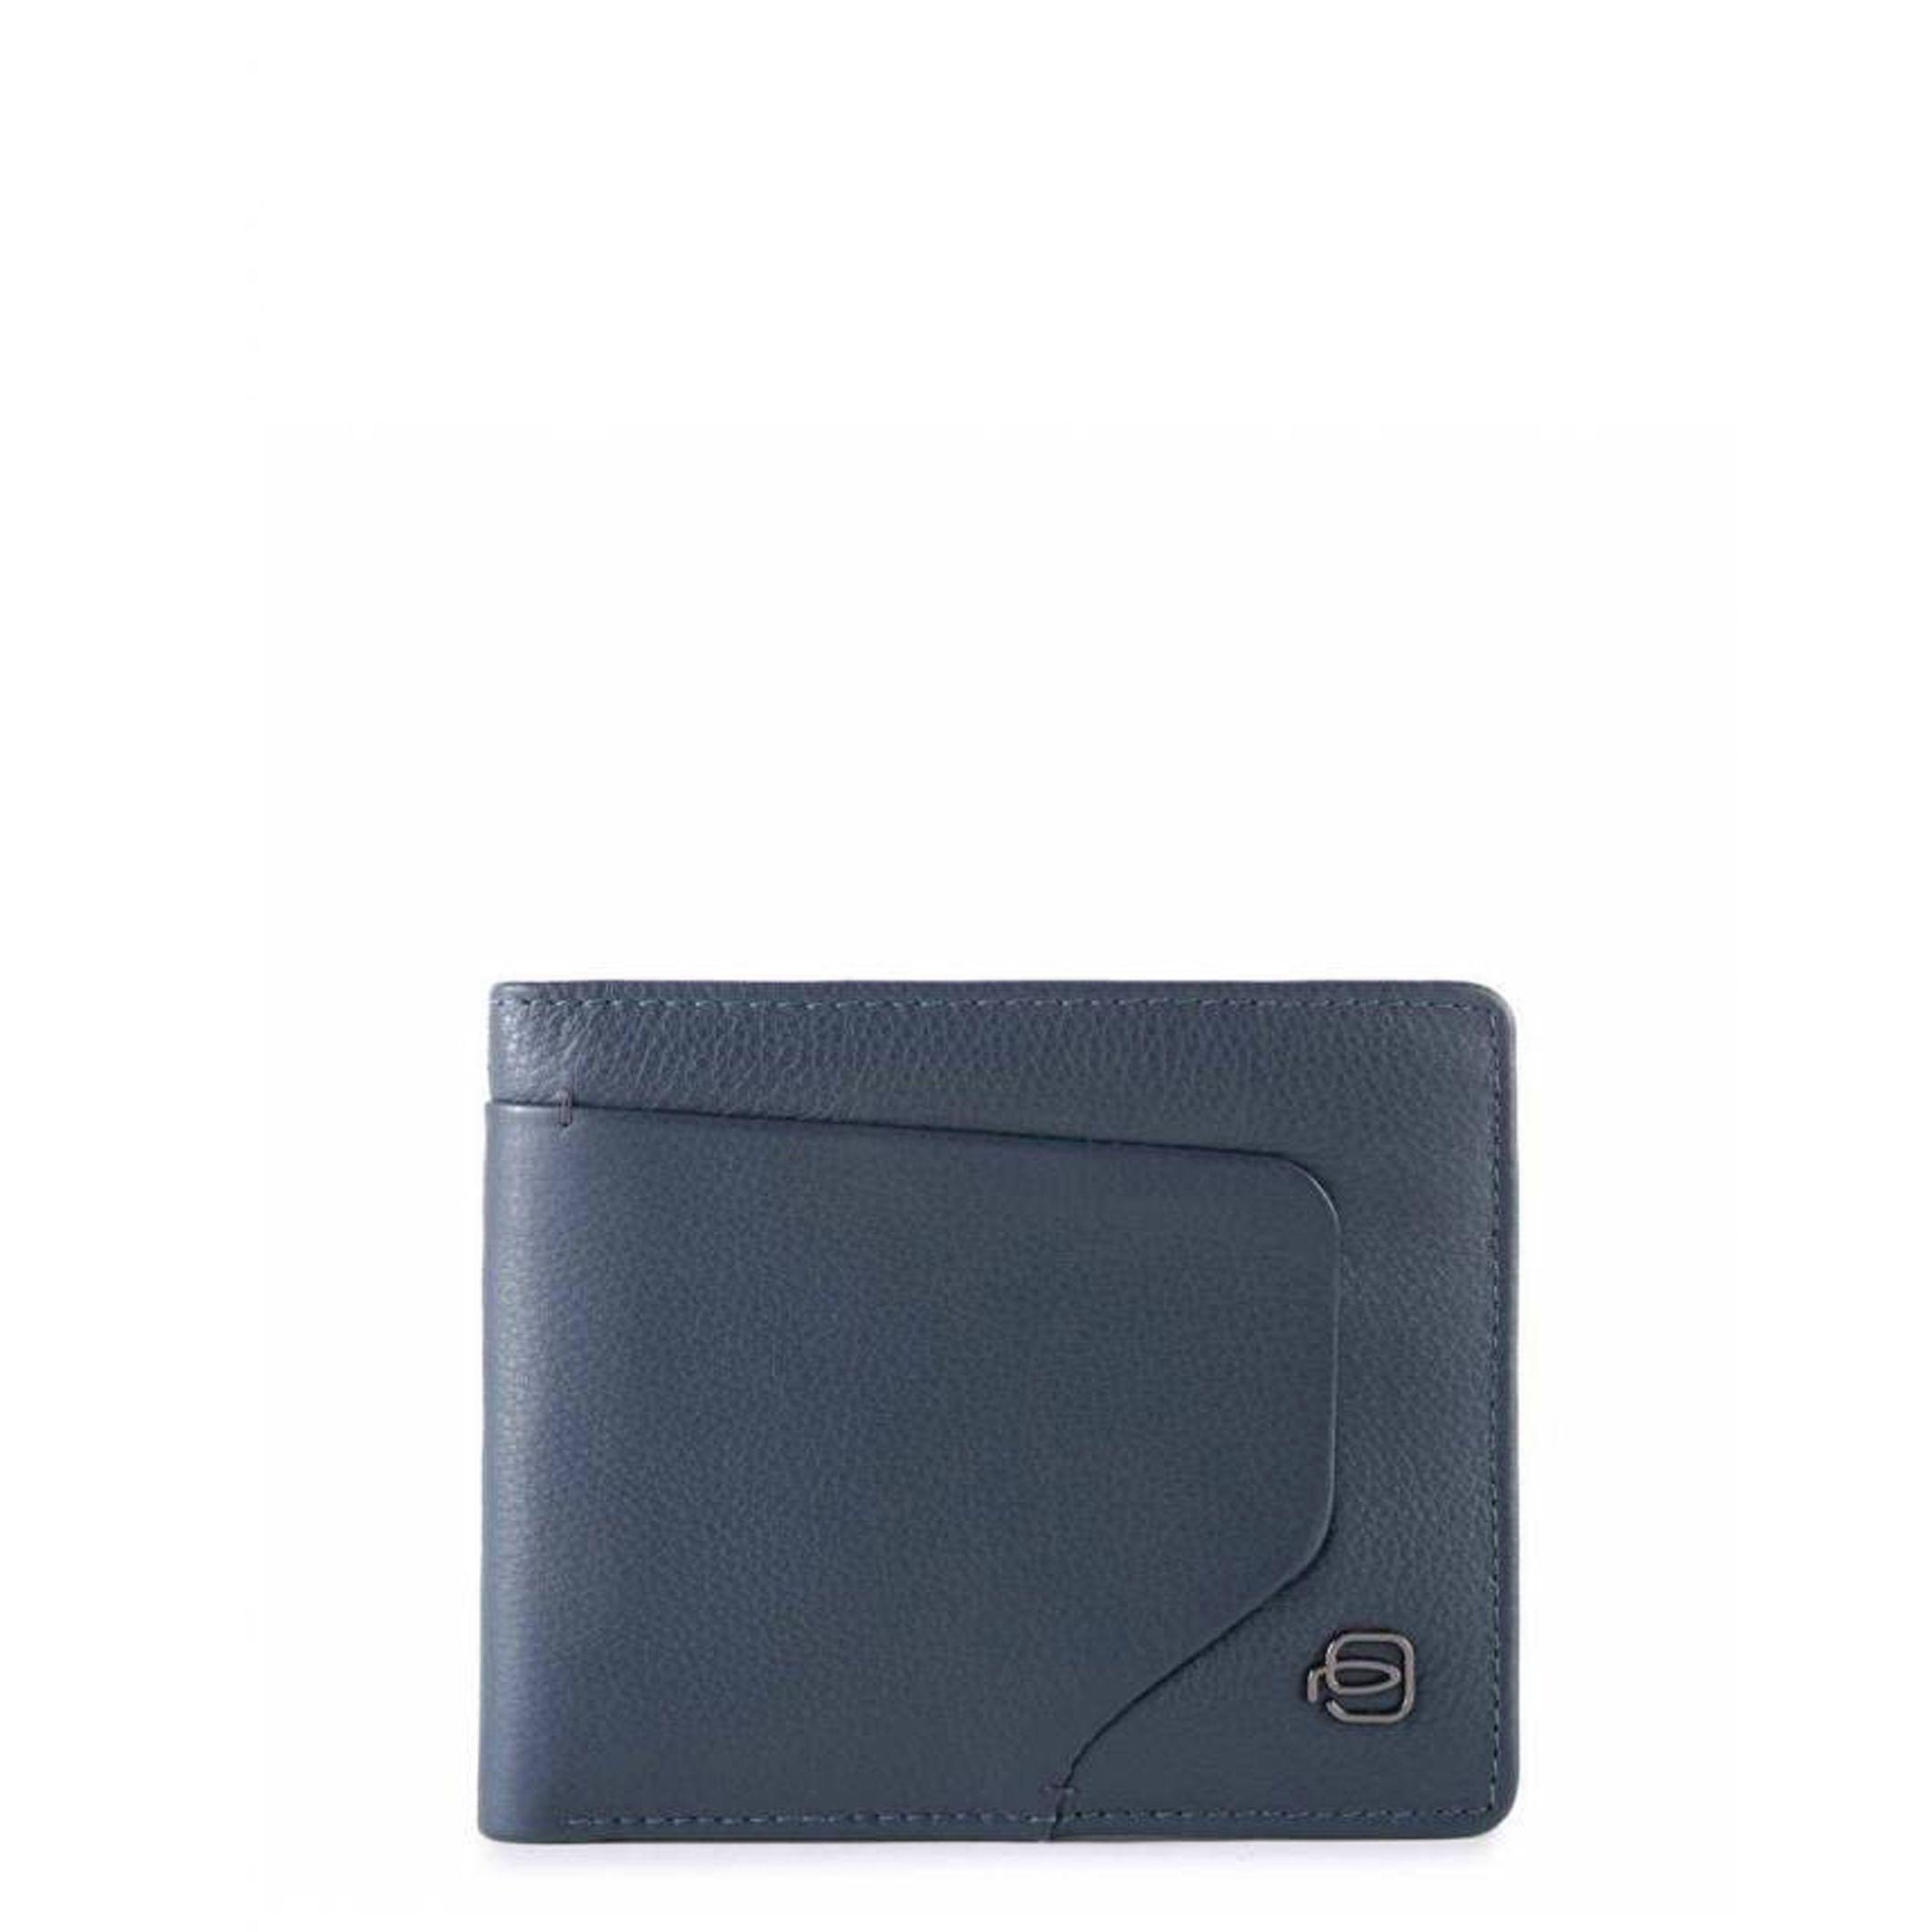 Piquadro - PU4518AOR | You Fashion Outlet